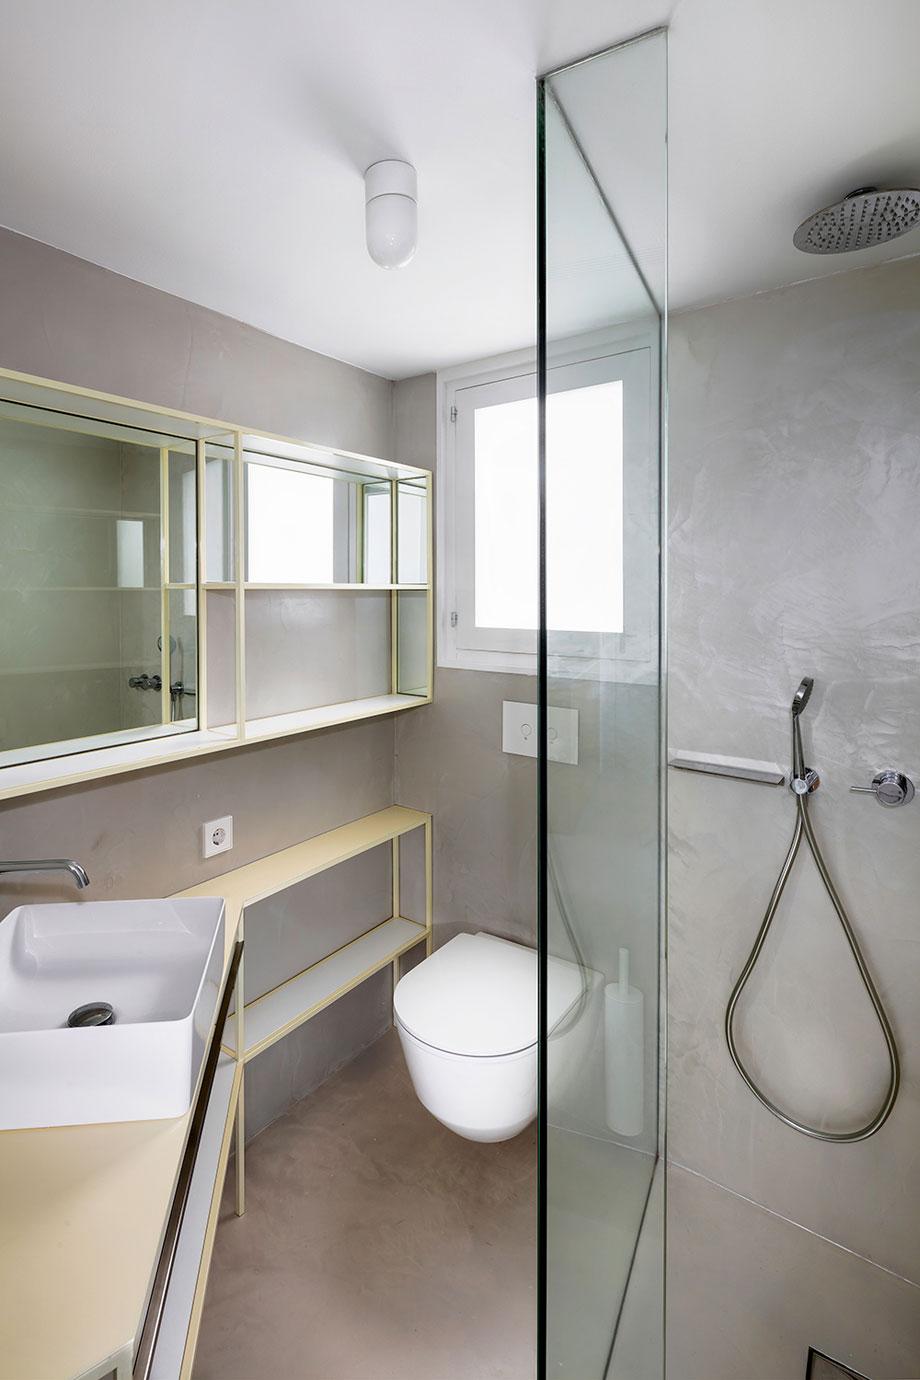 apartamento en altafulla de agusti costa (12) - foto david cardelus